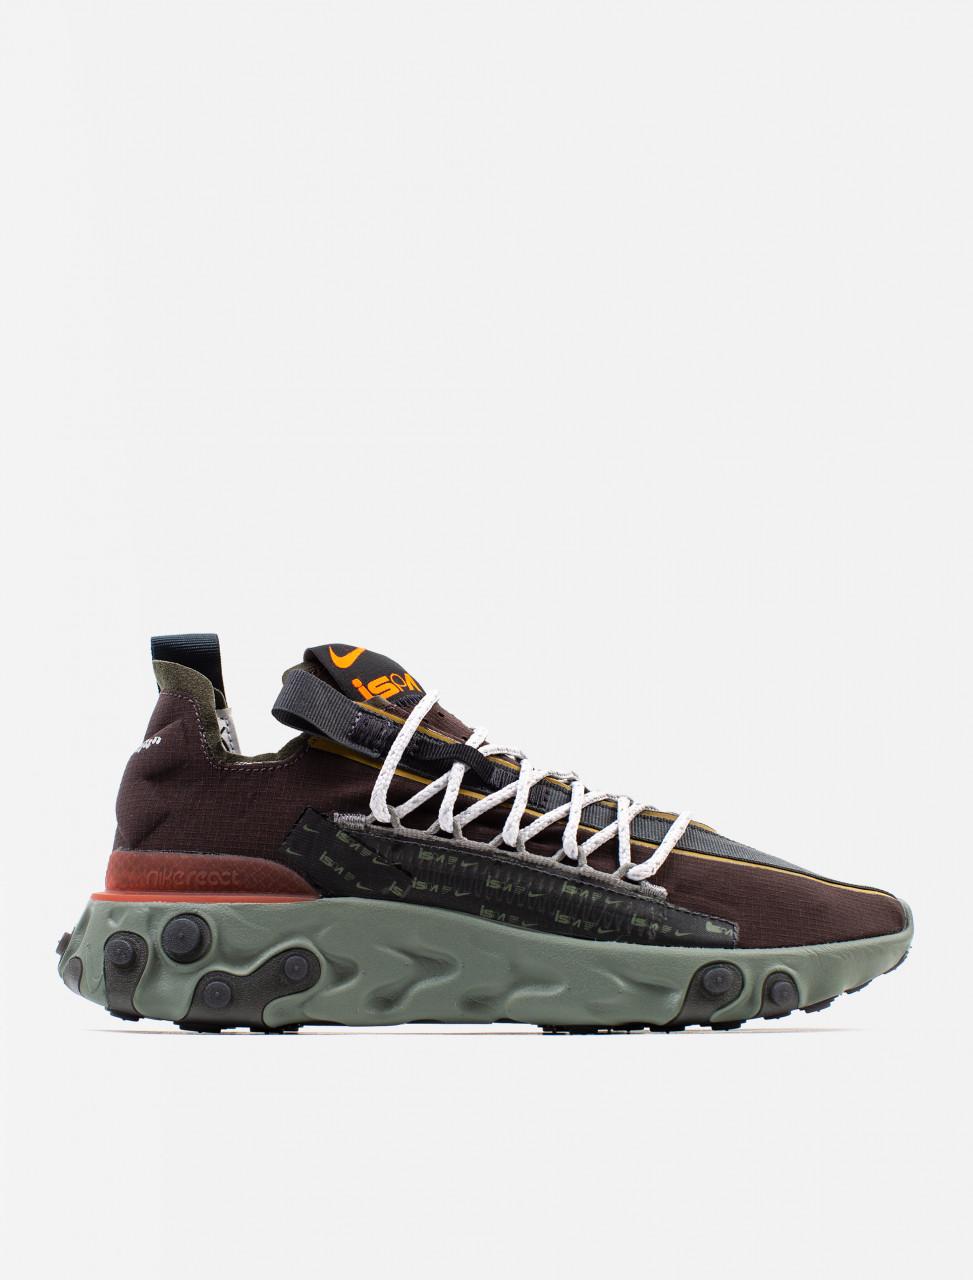 837c3828686b Nike ISPA React WR Sneaker